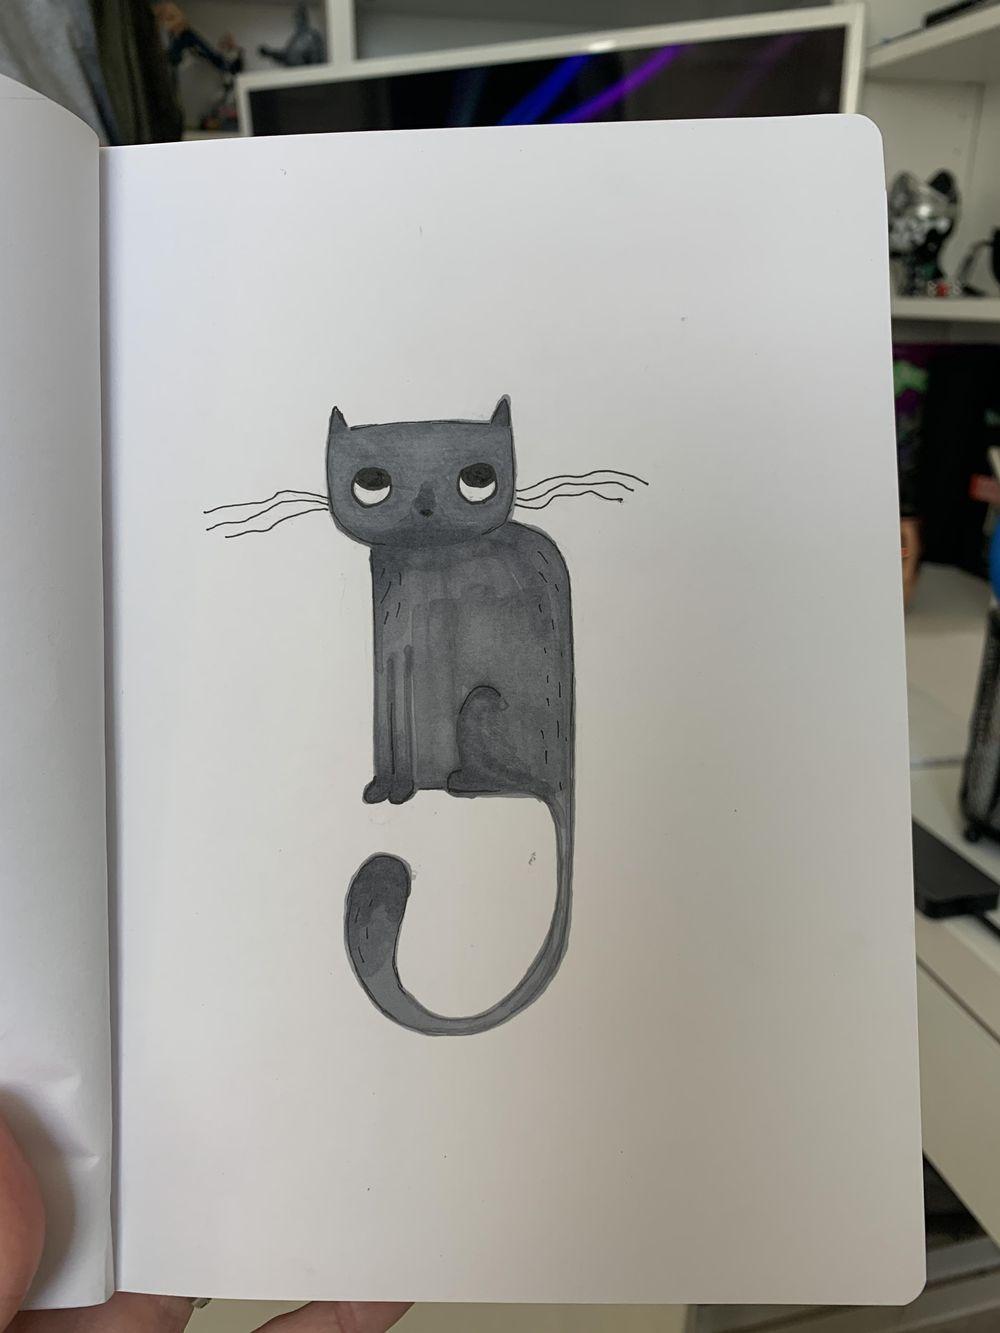 My Cat Raja - image 1 - student project